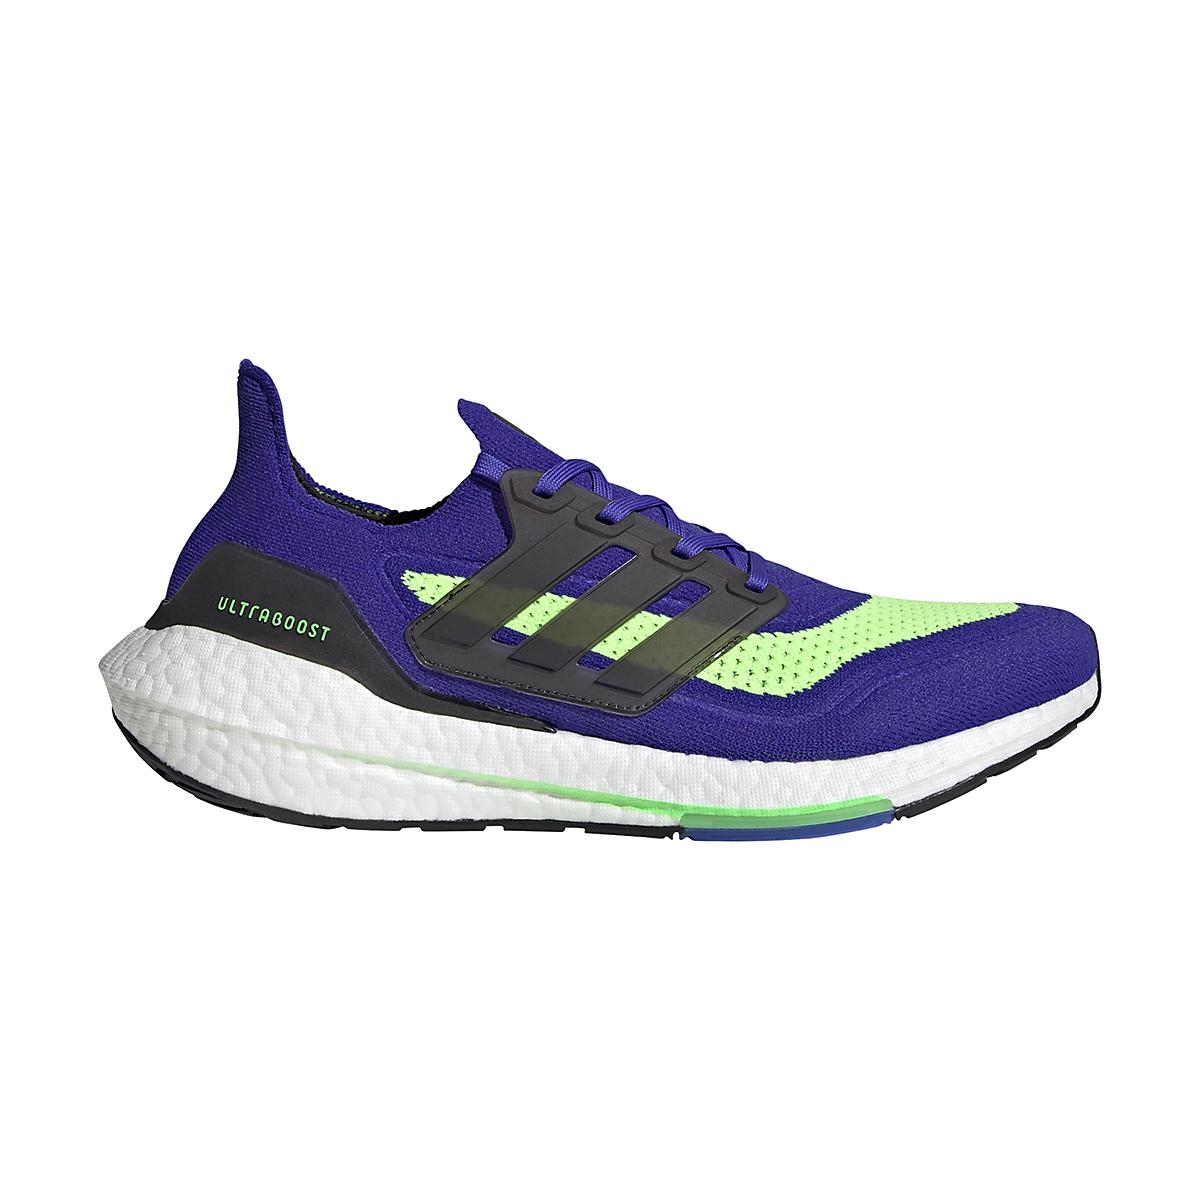 Men's Adidas UltraBOOST 21 Running Shoe - Color: Sonic Ink/Core Black/Screaming Green - Size: 6 - Width: Regular, Sonic Ink/Core Black/Screaming Green, large, image 1